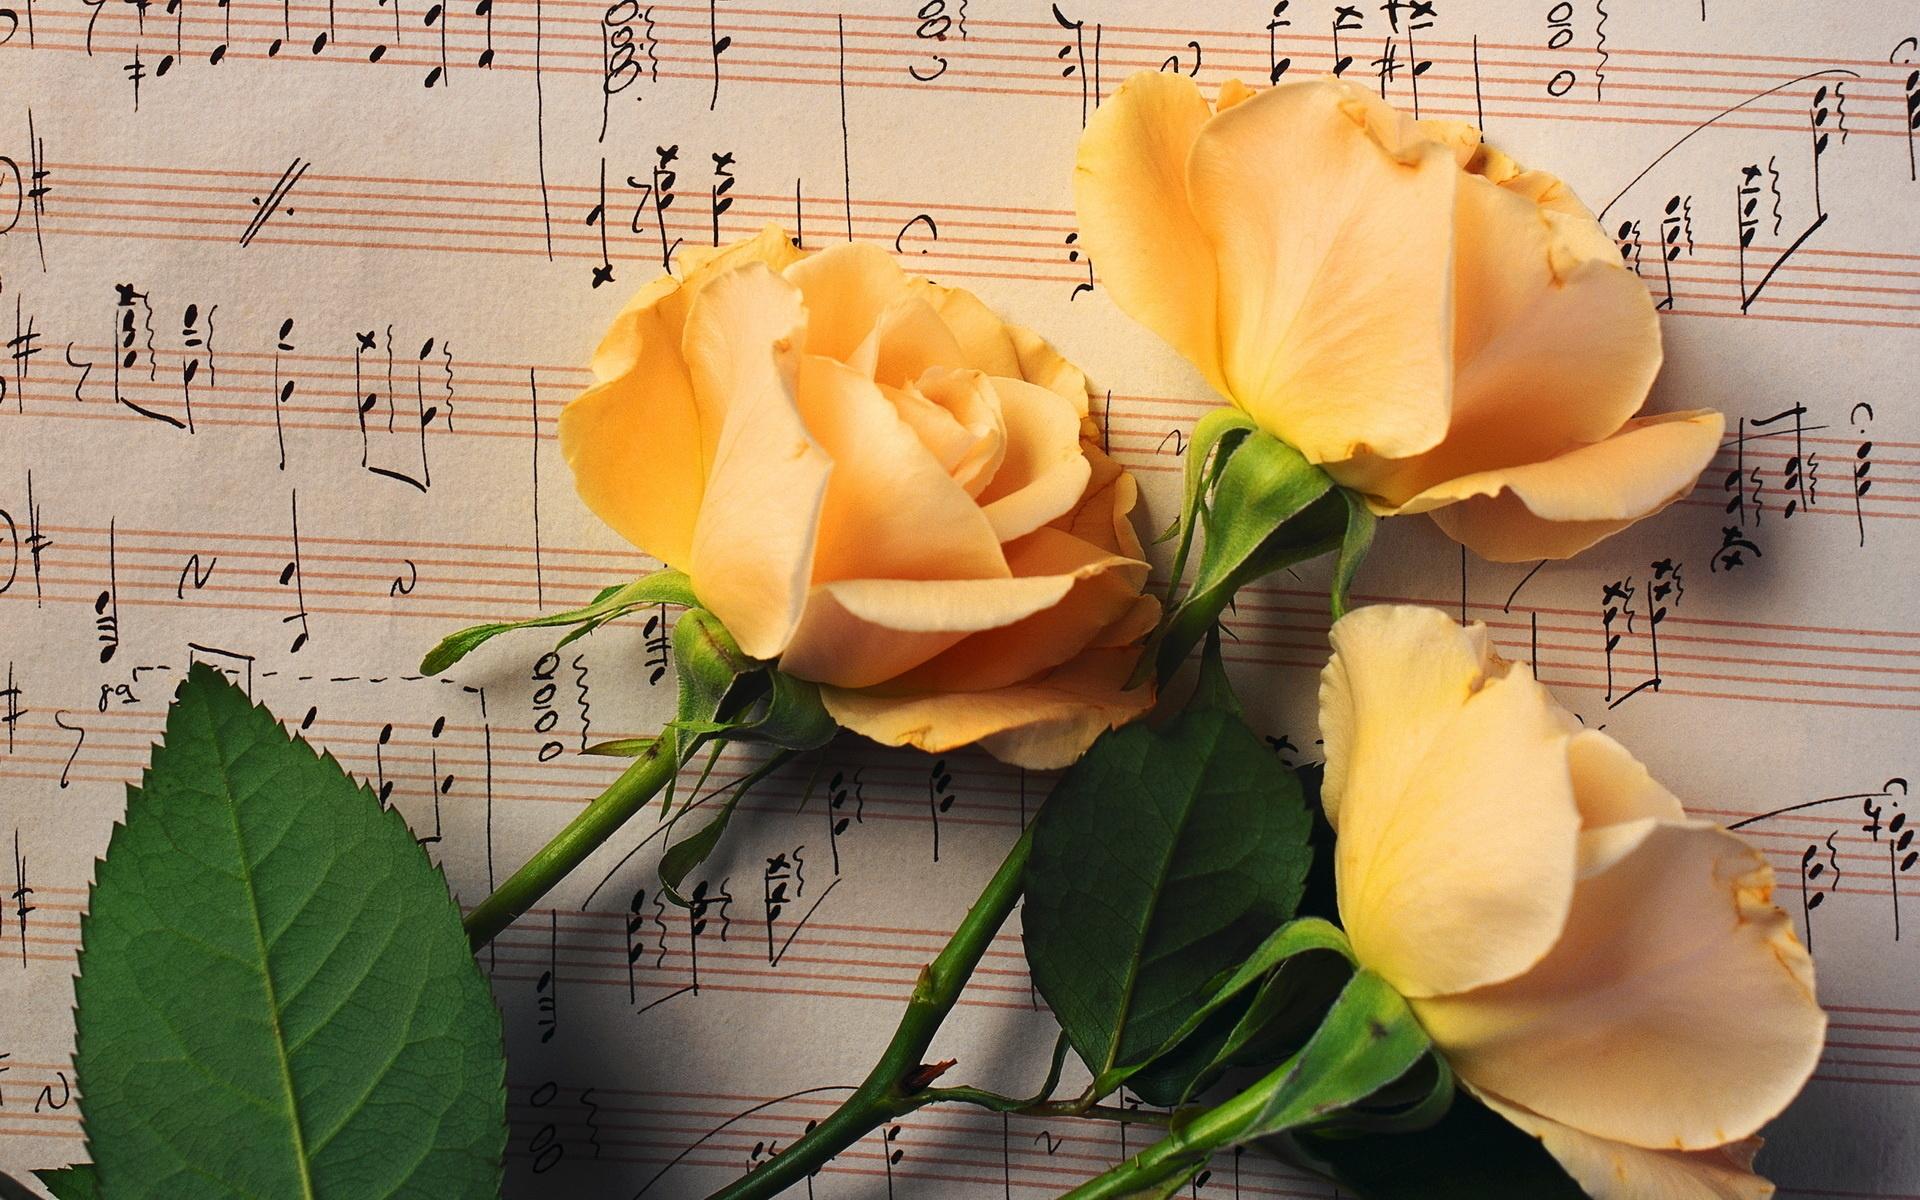 Sing a Song of Flowers | Song Lyrics | Preschool ... - YouTube